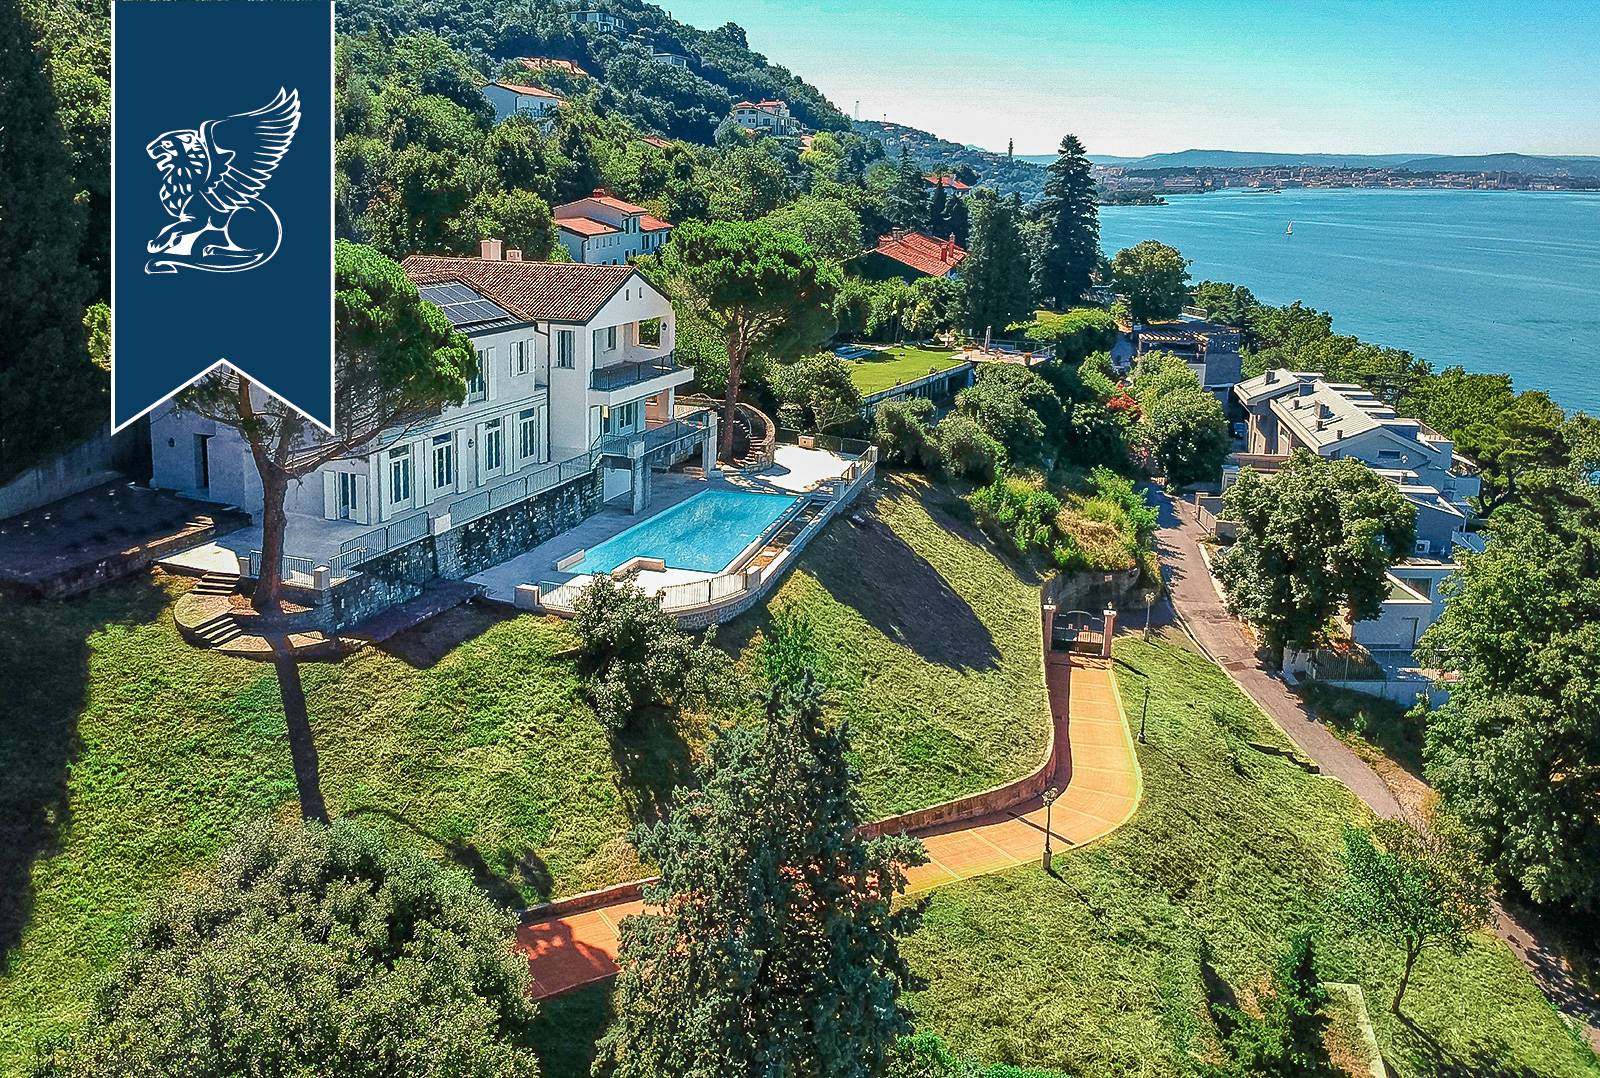 Villa in Vendita a Trieste: 0 locali, 900 mq - Foto 1